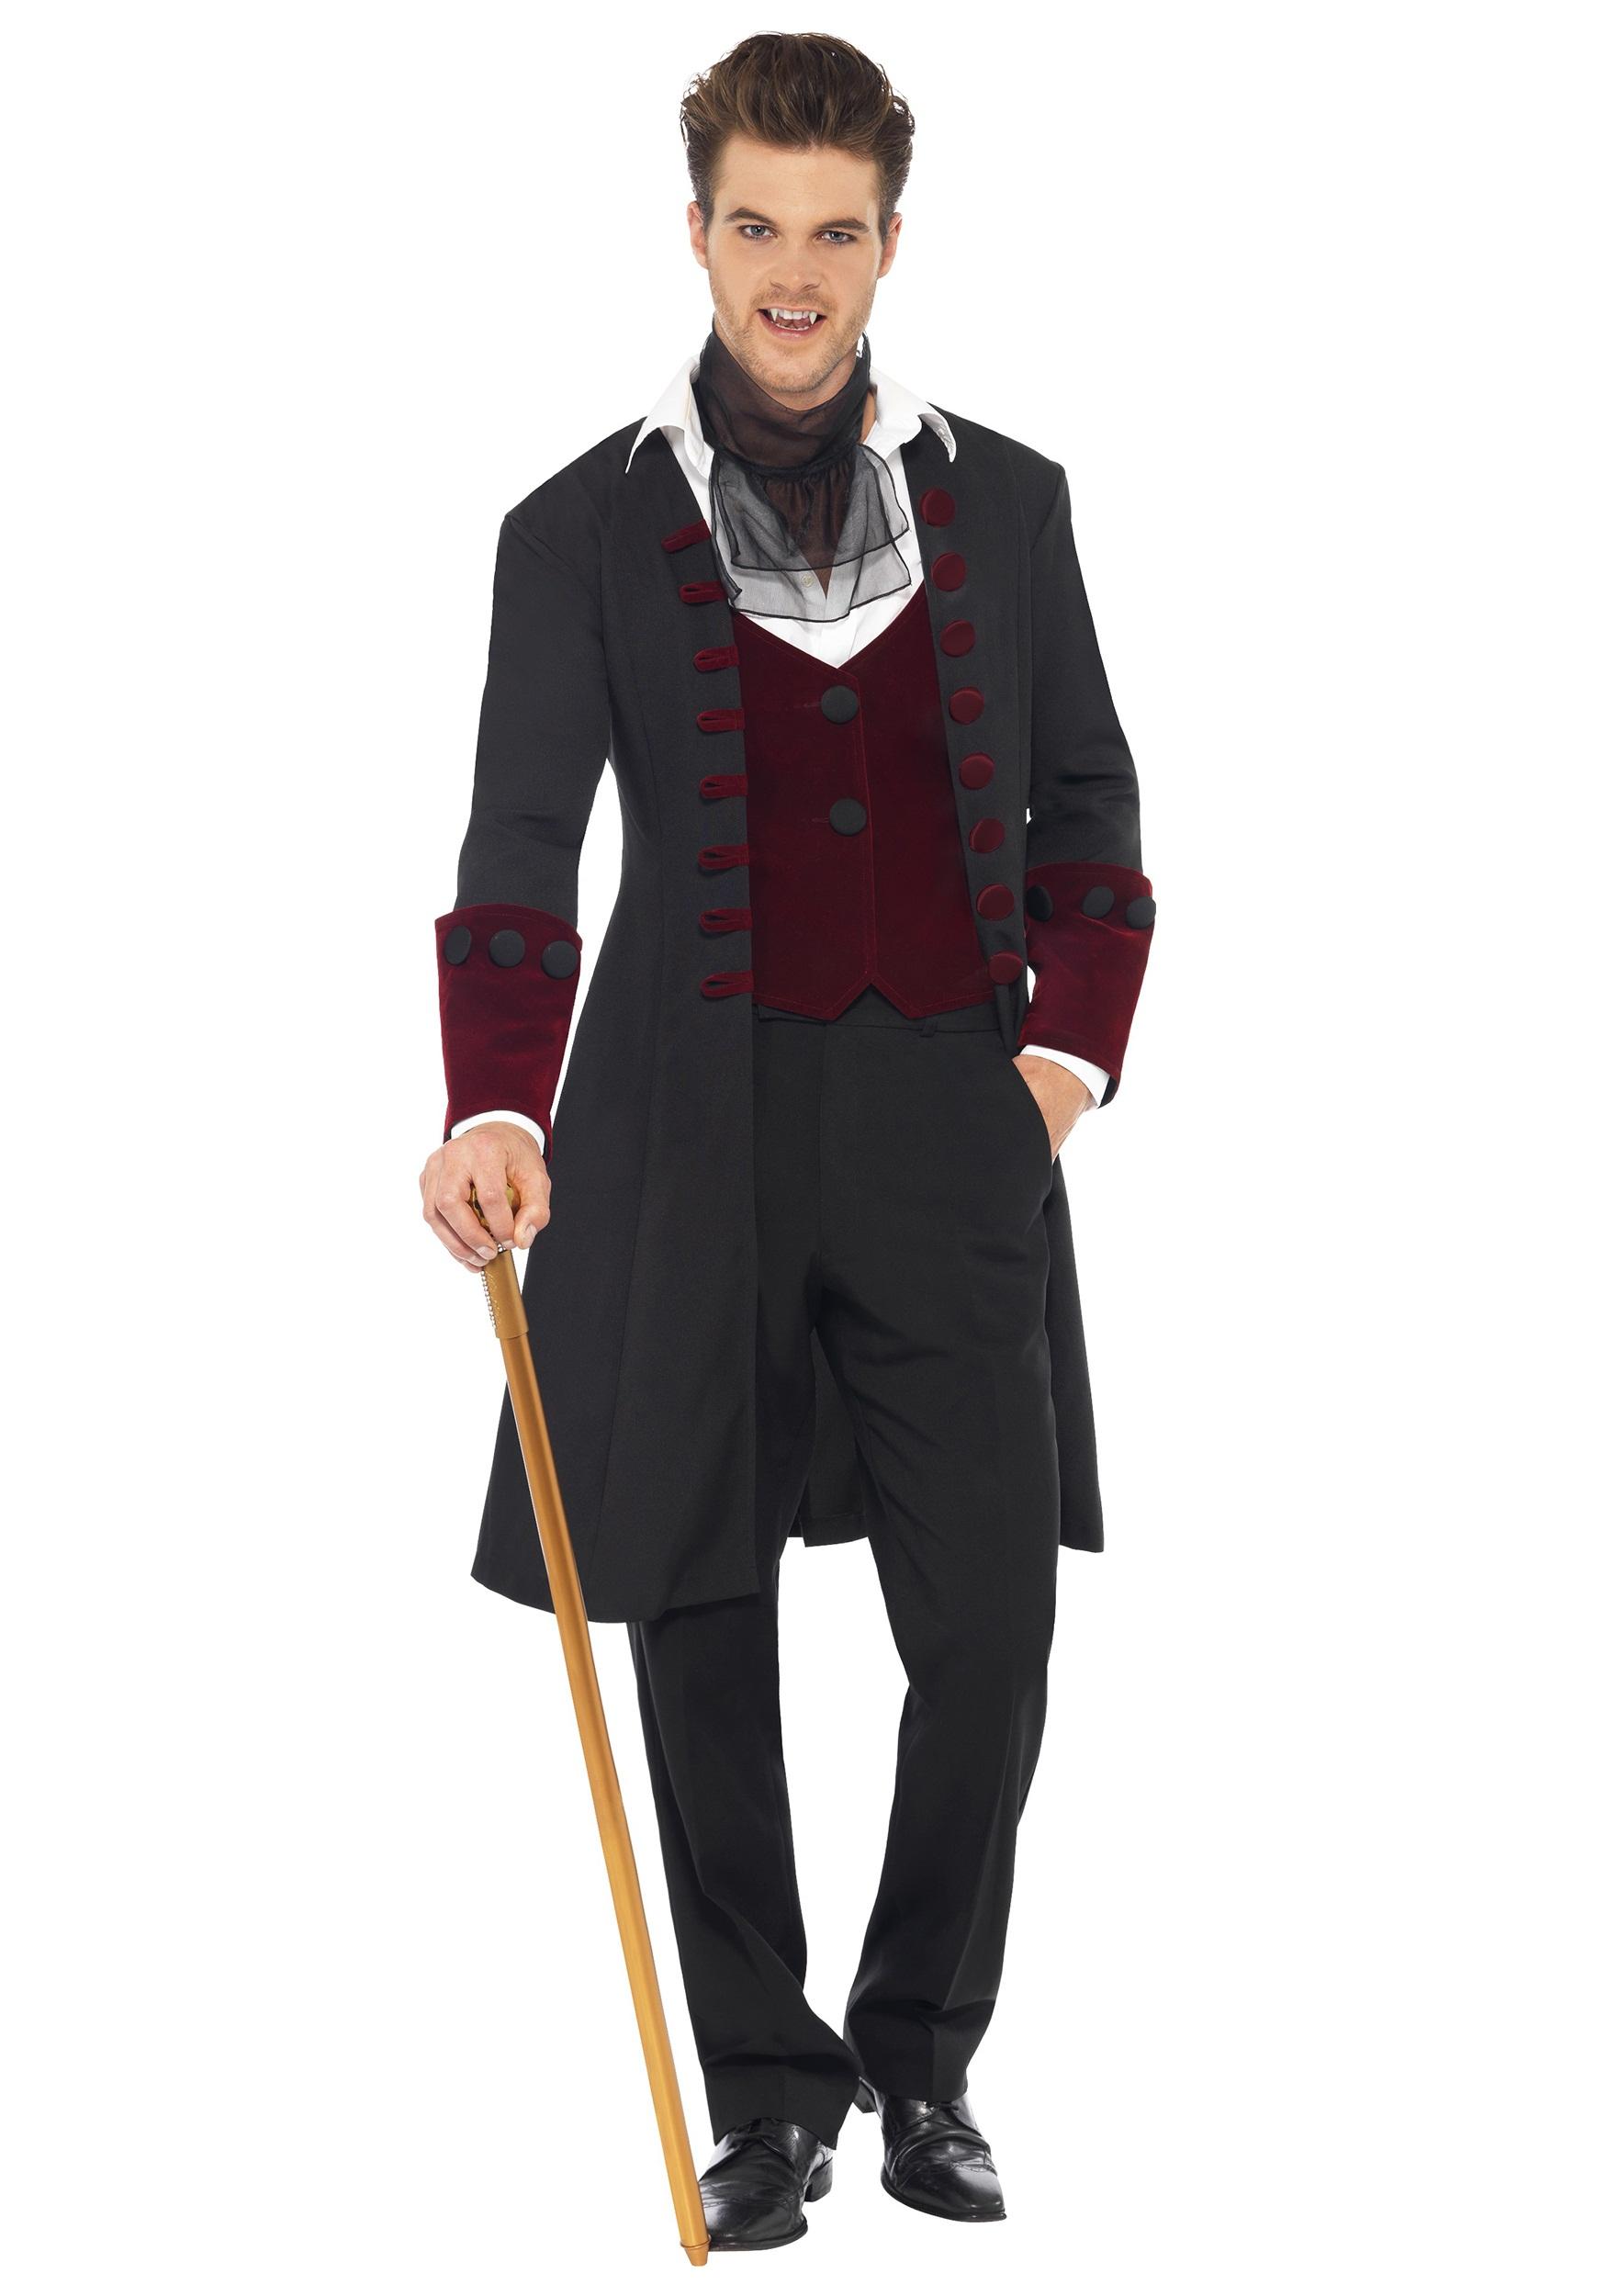 Sexy Vampire Costume Men : vampire, costume, Adult, Gothic, Vampire, Costume